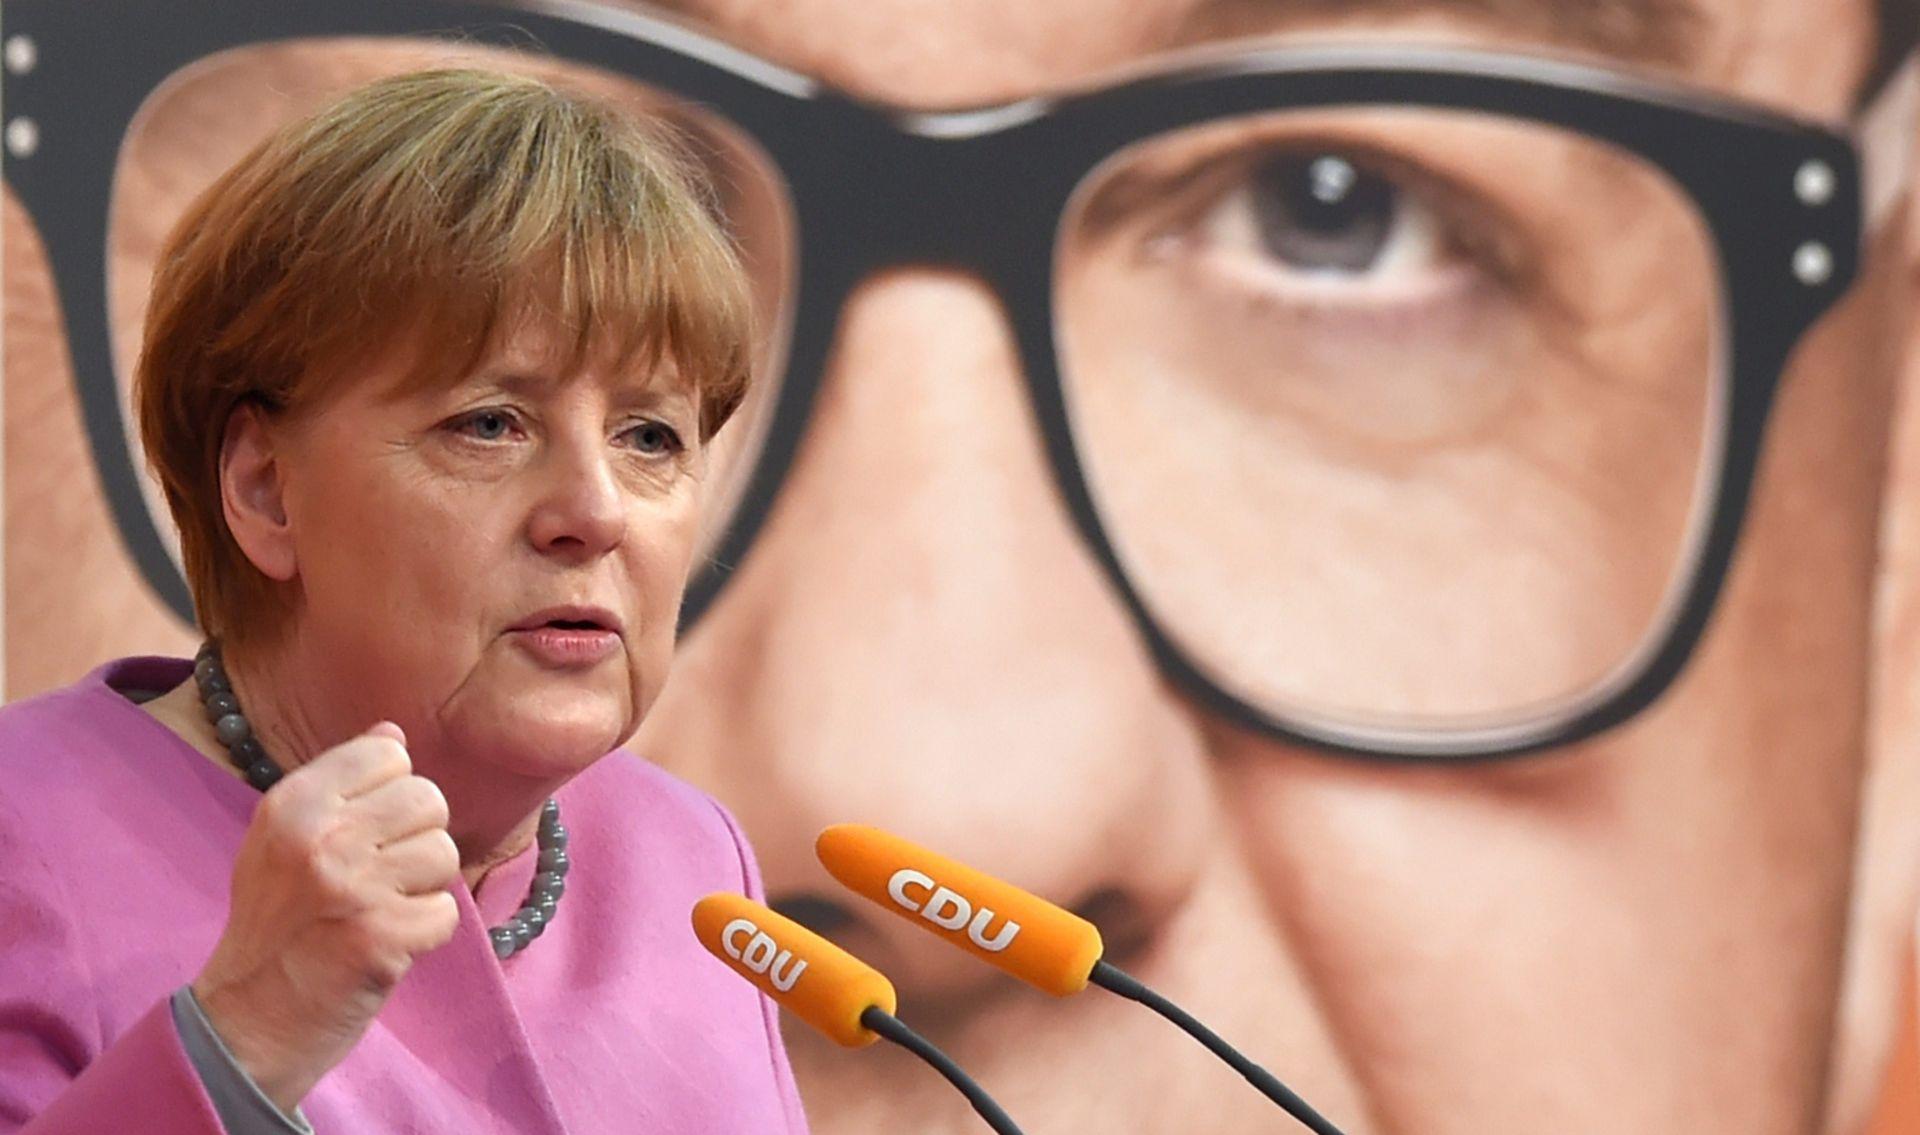 MEDIJI Merkel protiv zatvaranje balkanske rute, ali joj odgovara